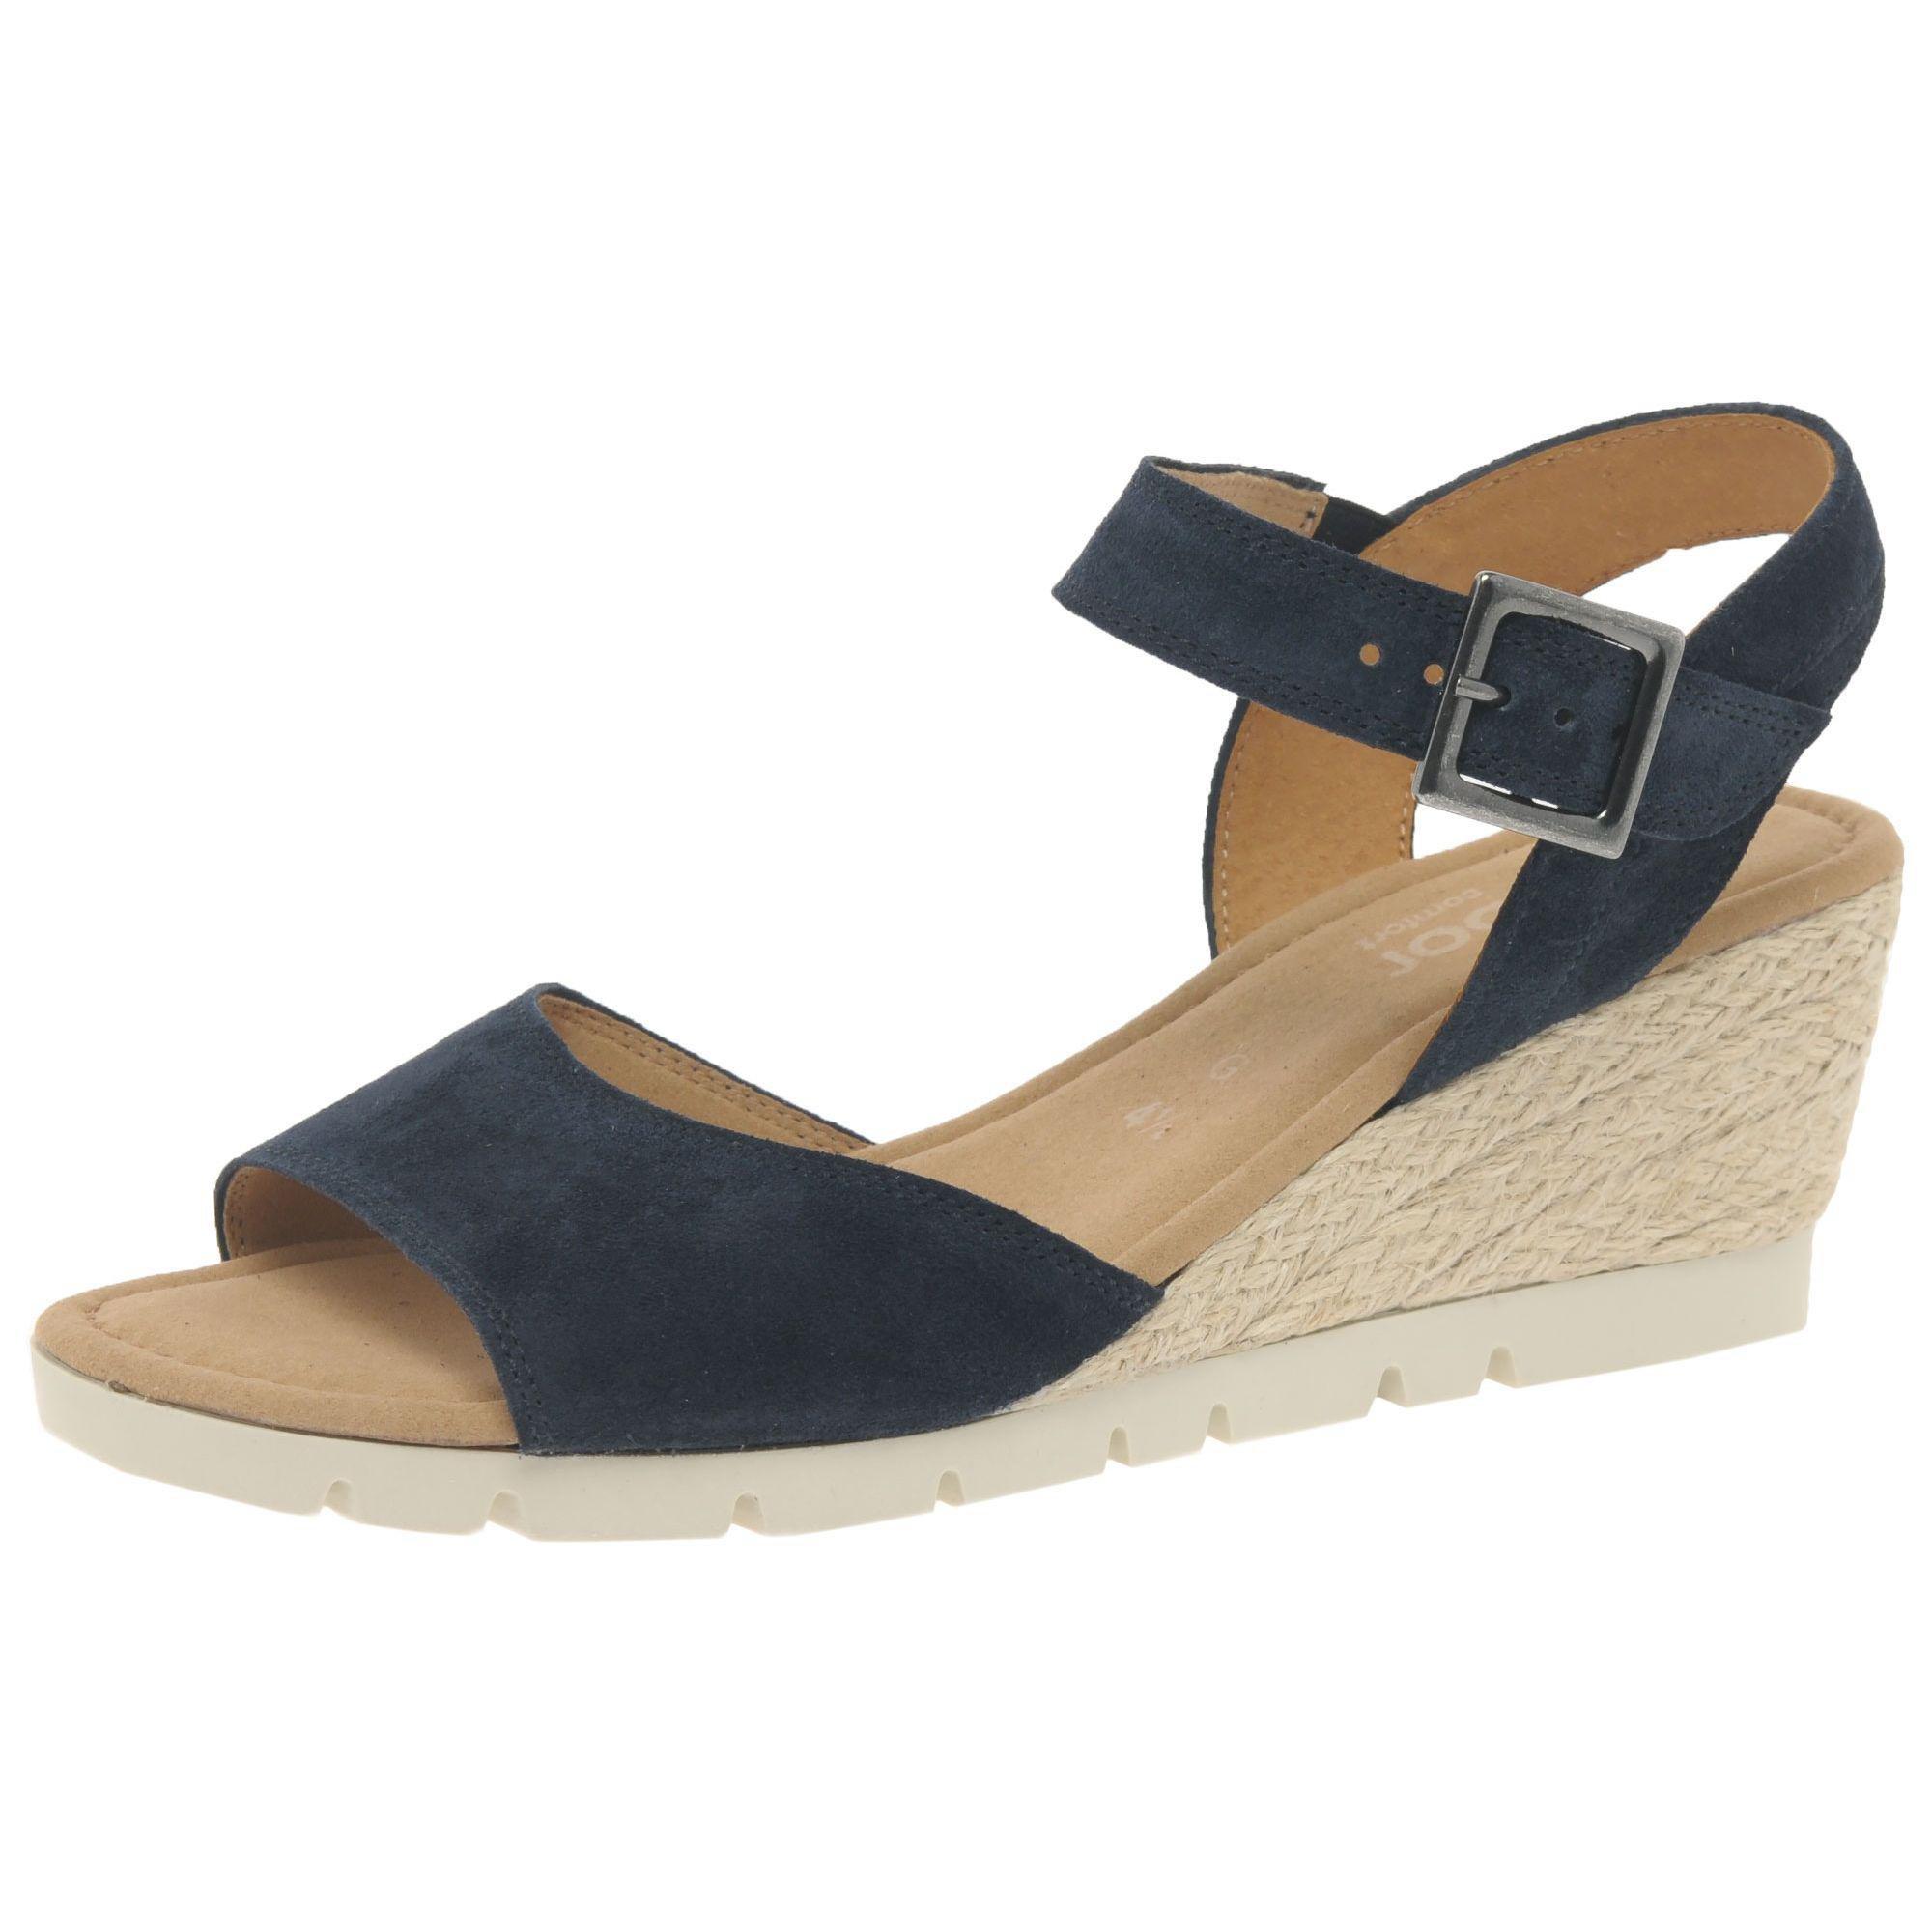 f3b4bd6339 John Lewis Gabor Nieve Wide Wedge Heeled Sandals in Blue - Lyst